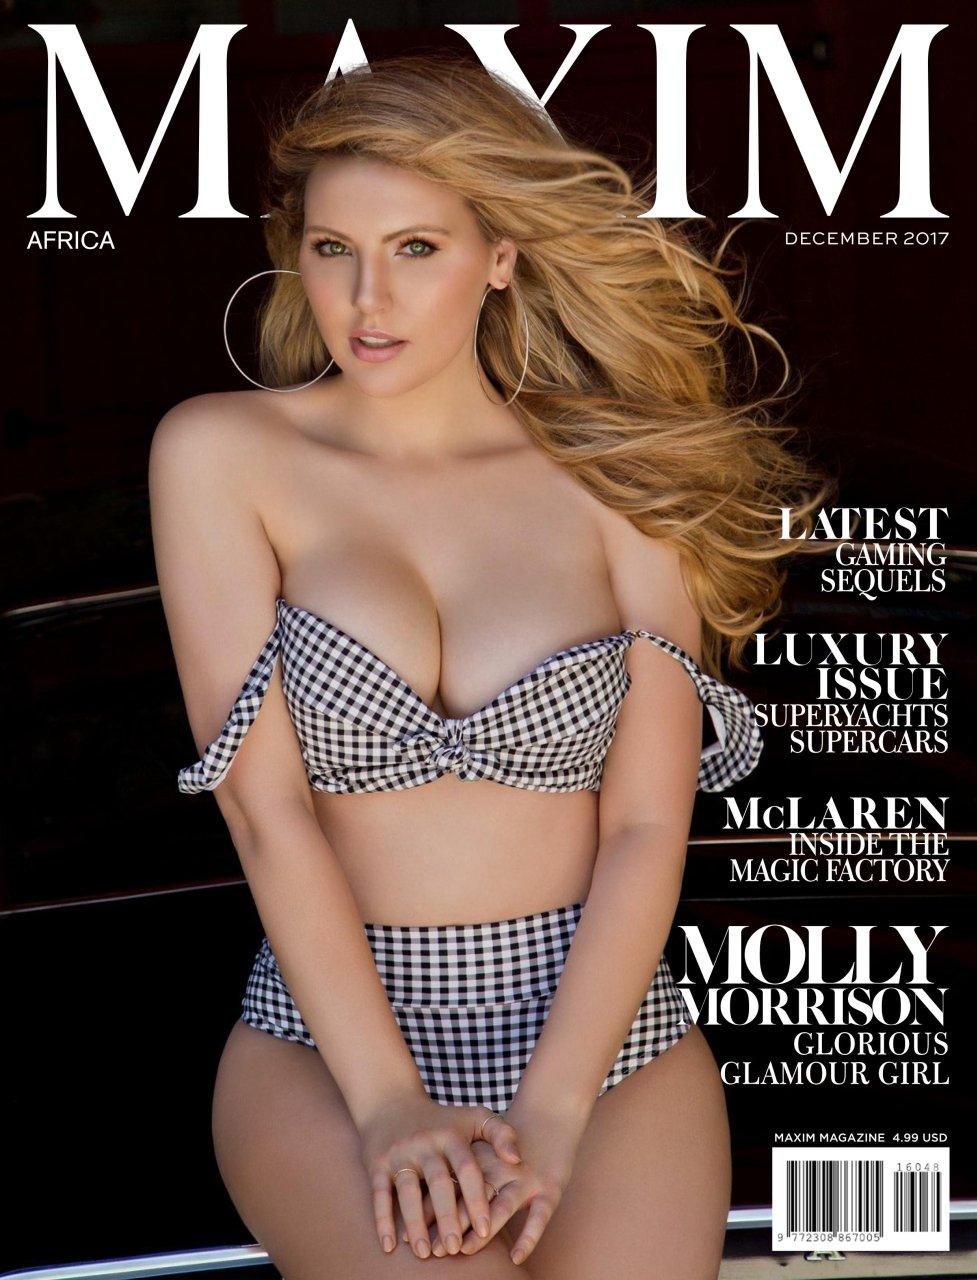 Molly-Morrison-1-thefappeningblog.com_.jpg